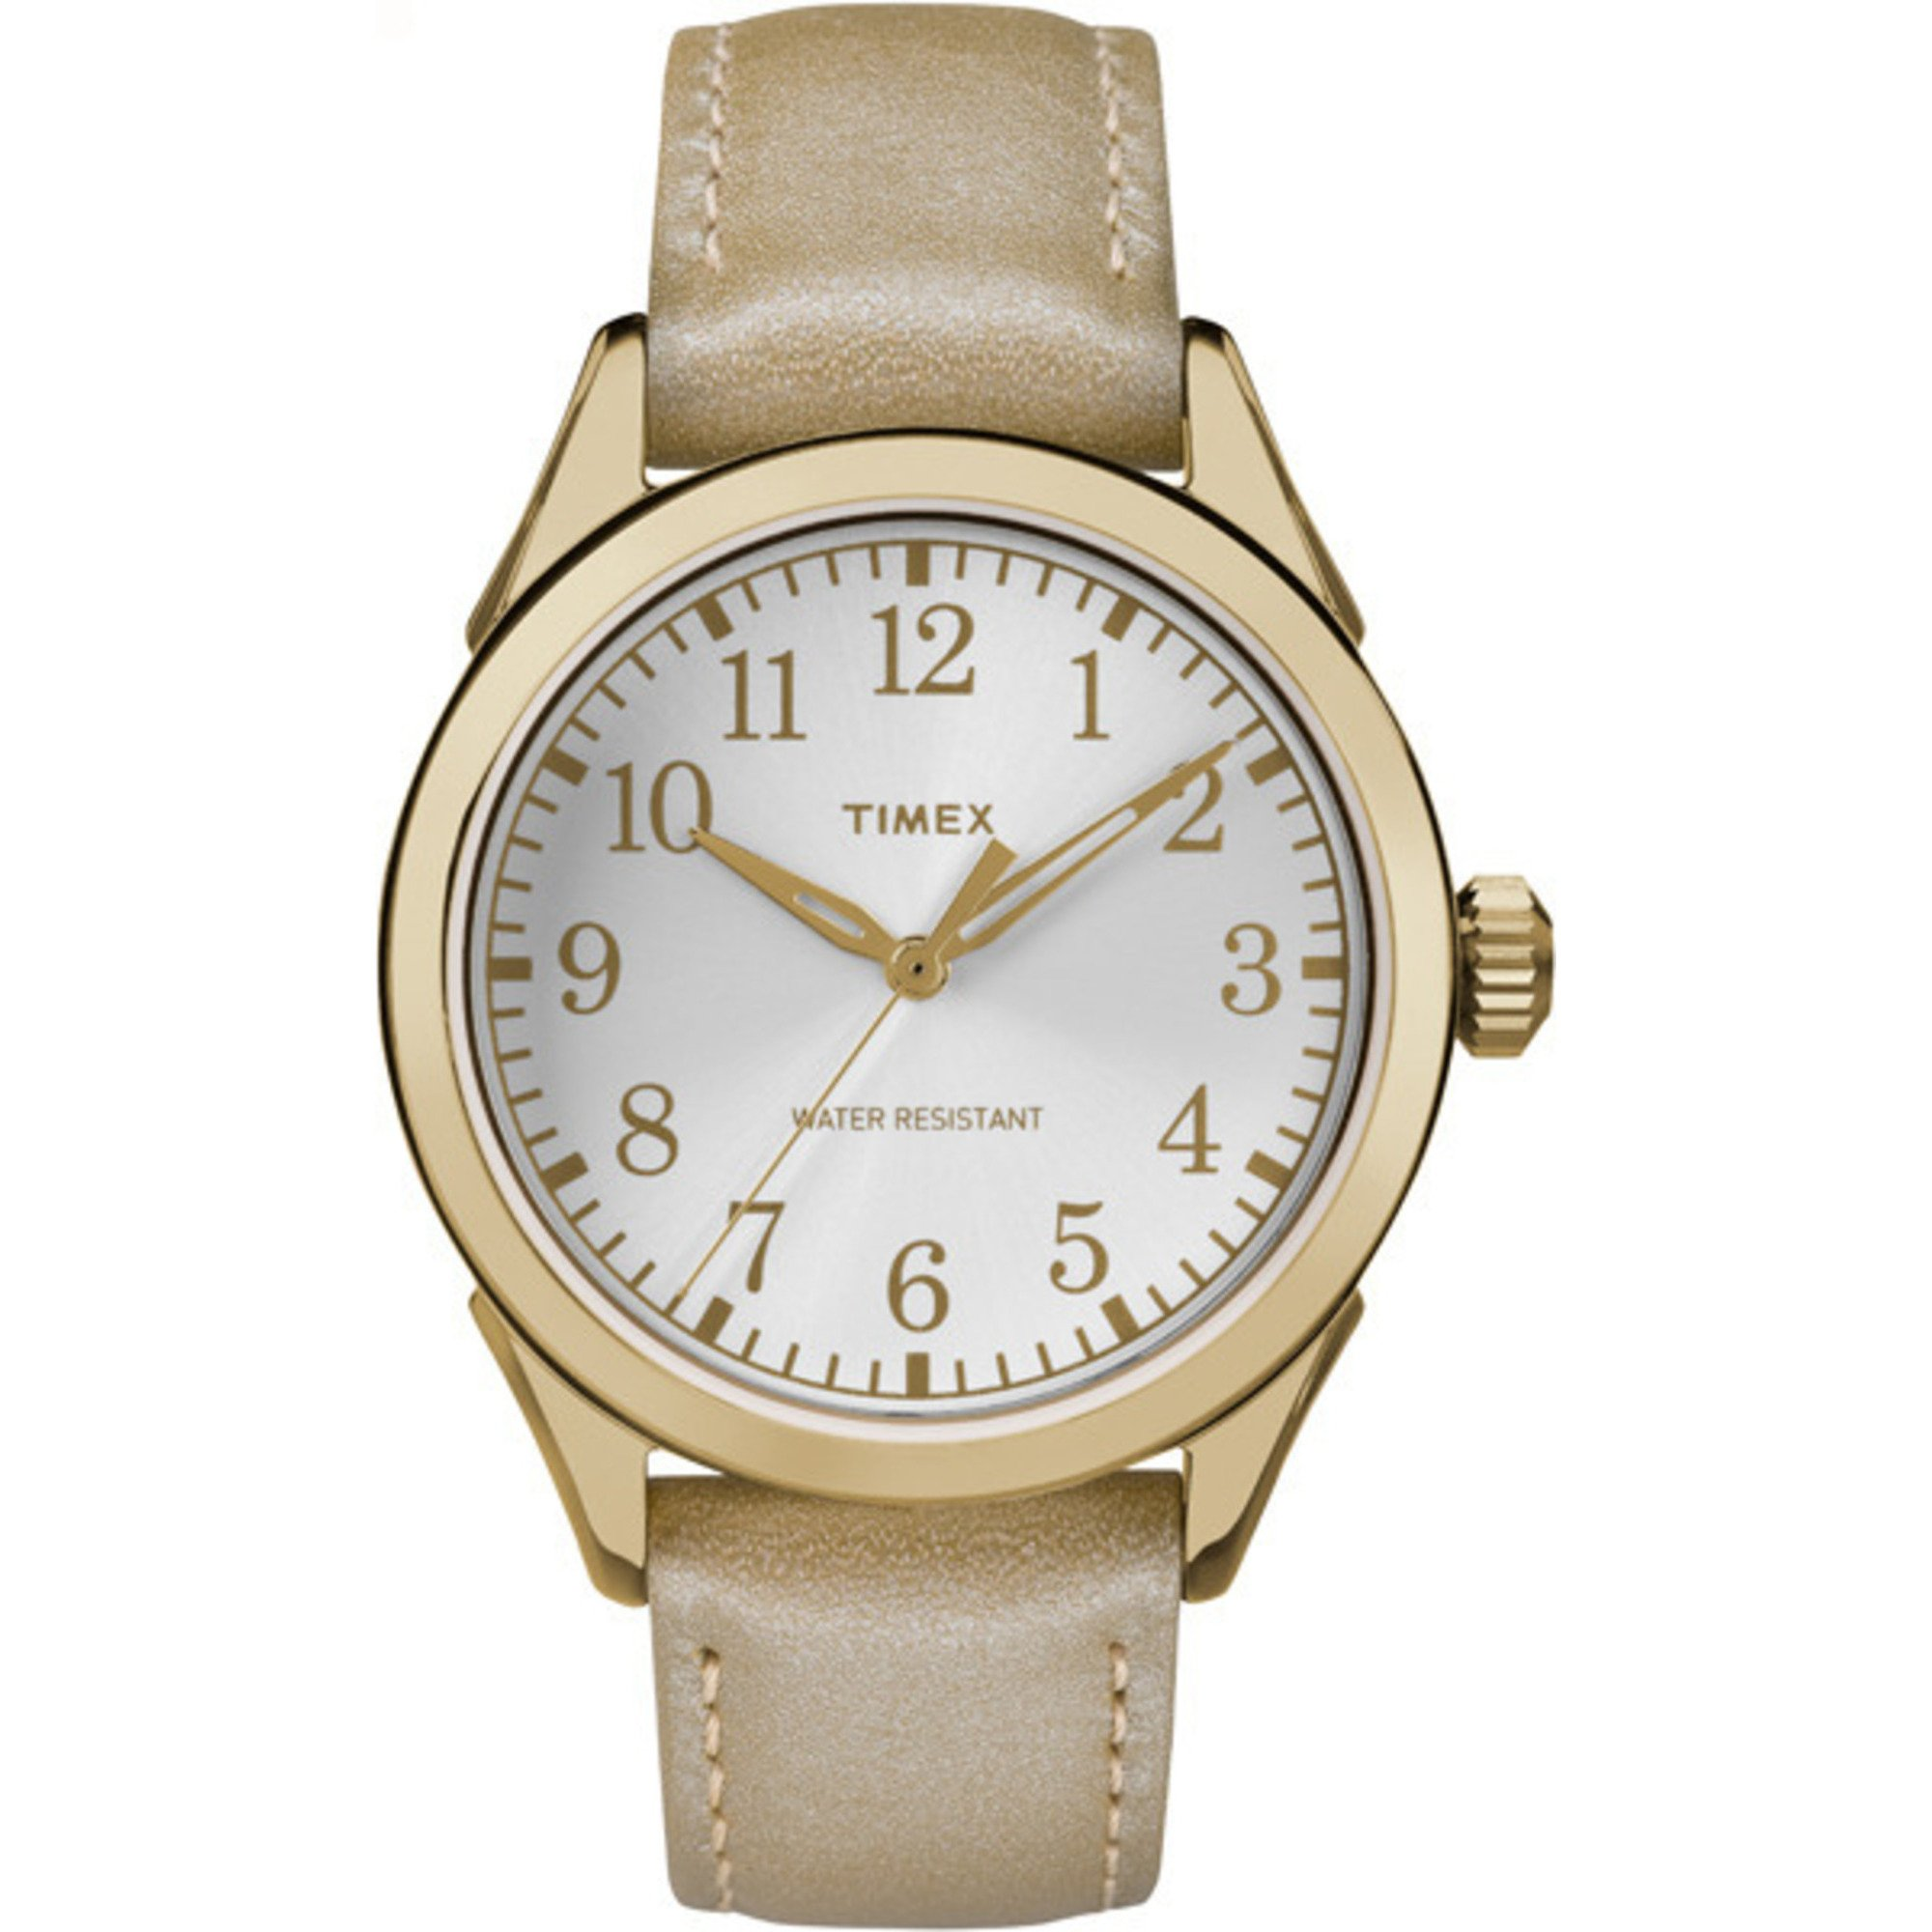 Timex Women's Briarwood Terrace | Gold-Tone Strap Silver-Tone Dial | TW2P99300